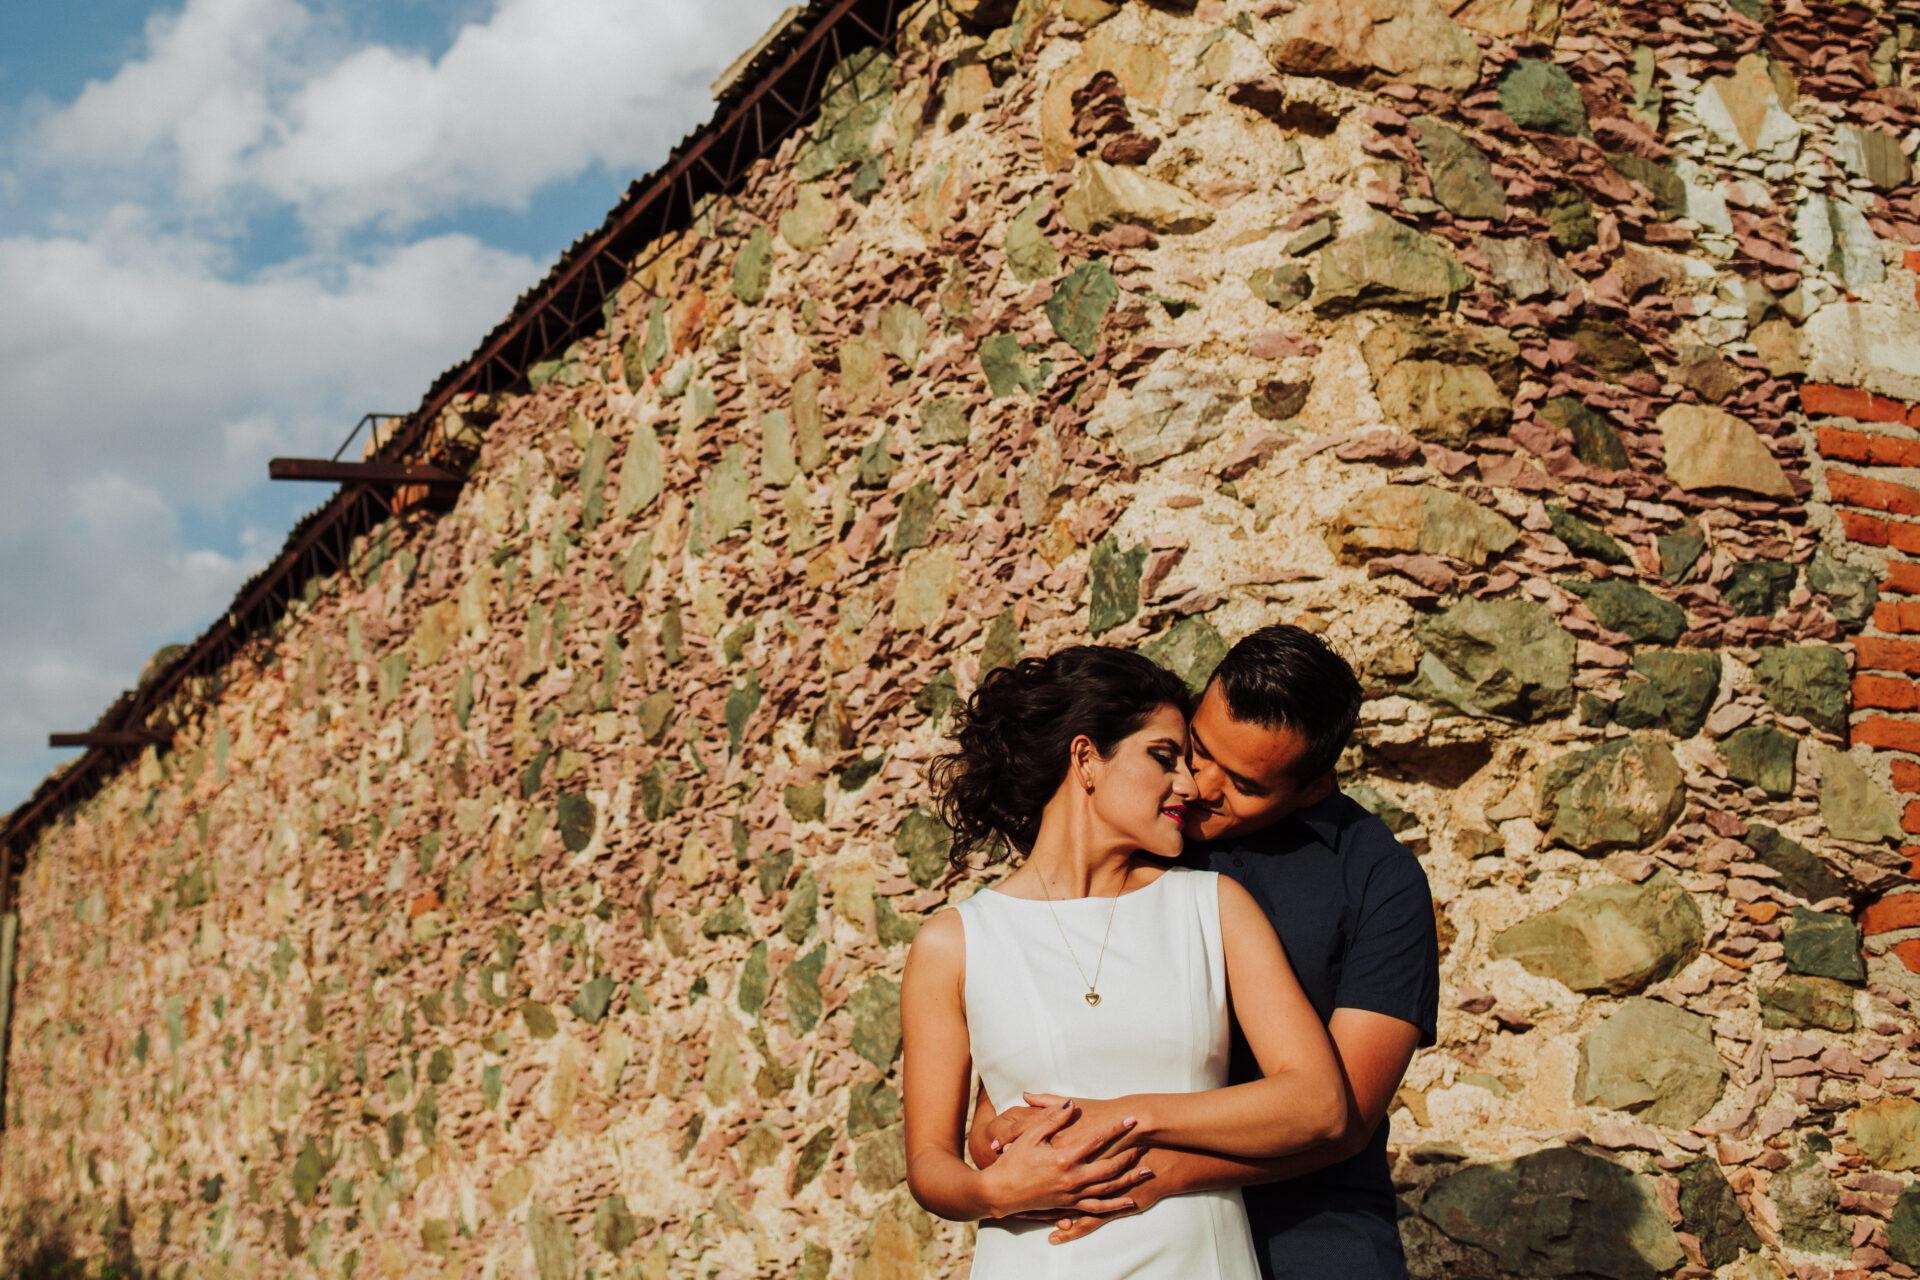 javier_noriega_fotografo_save_the_date_zacatecas_wedding_photographer9